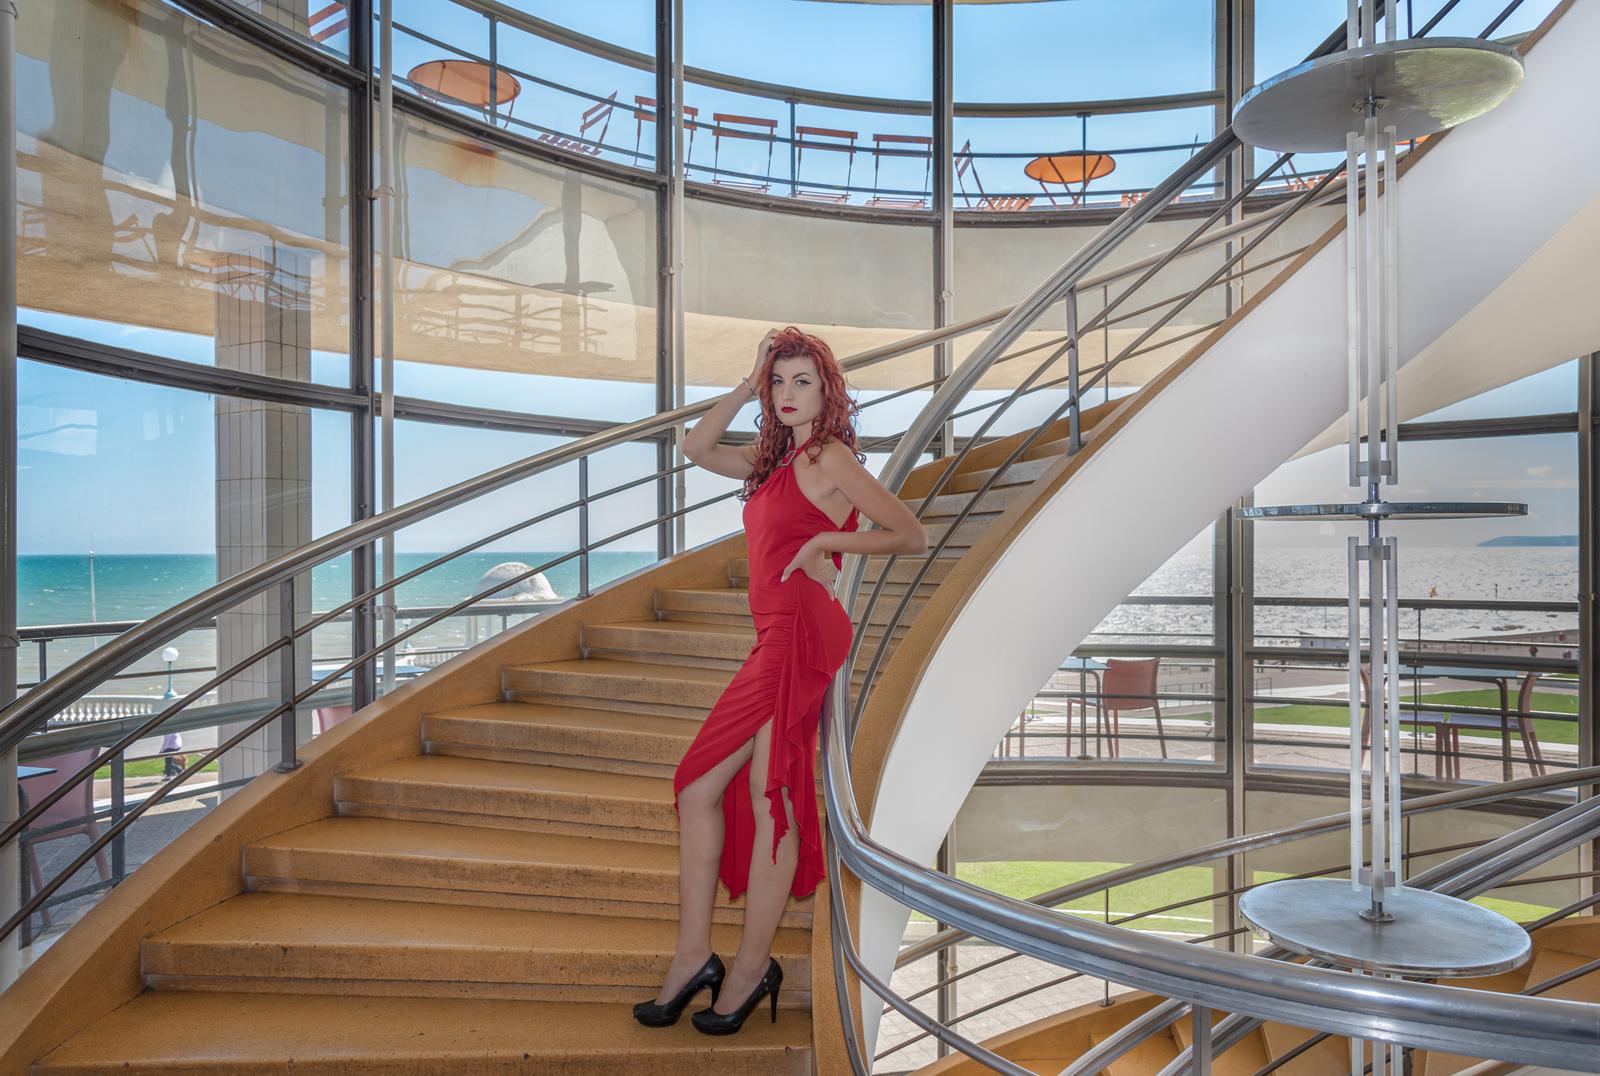 Lady in Red De La Warr Pavilion